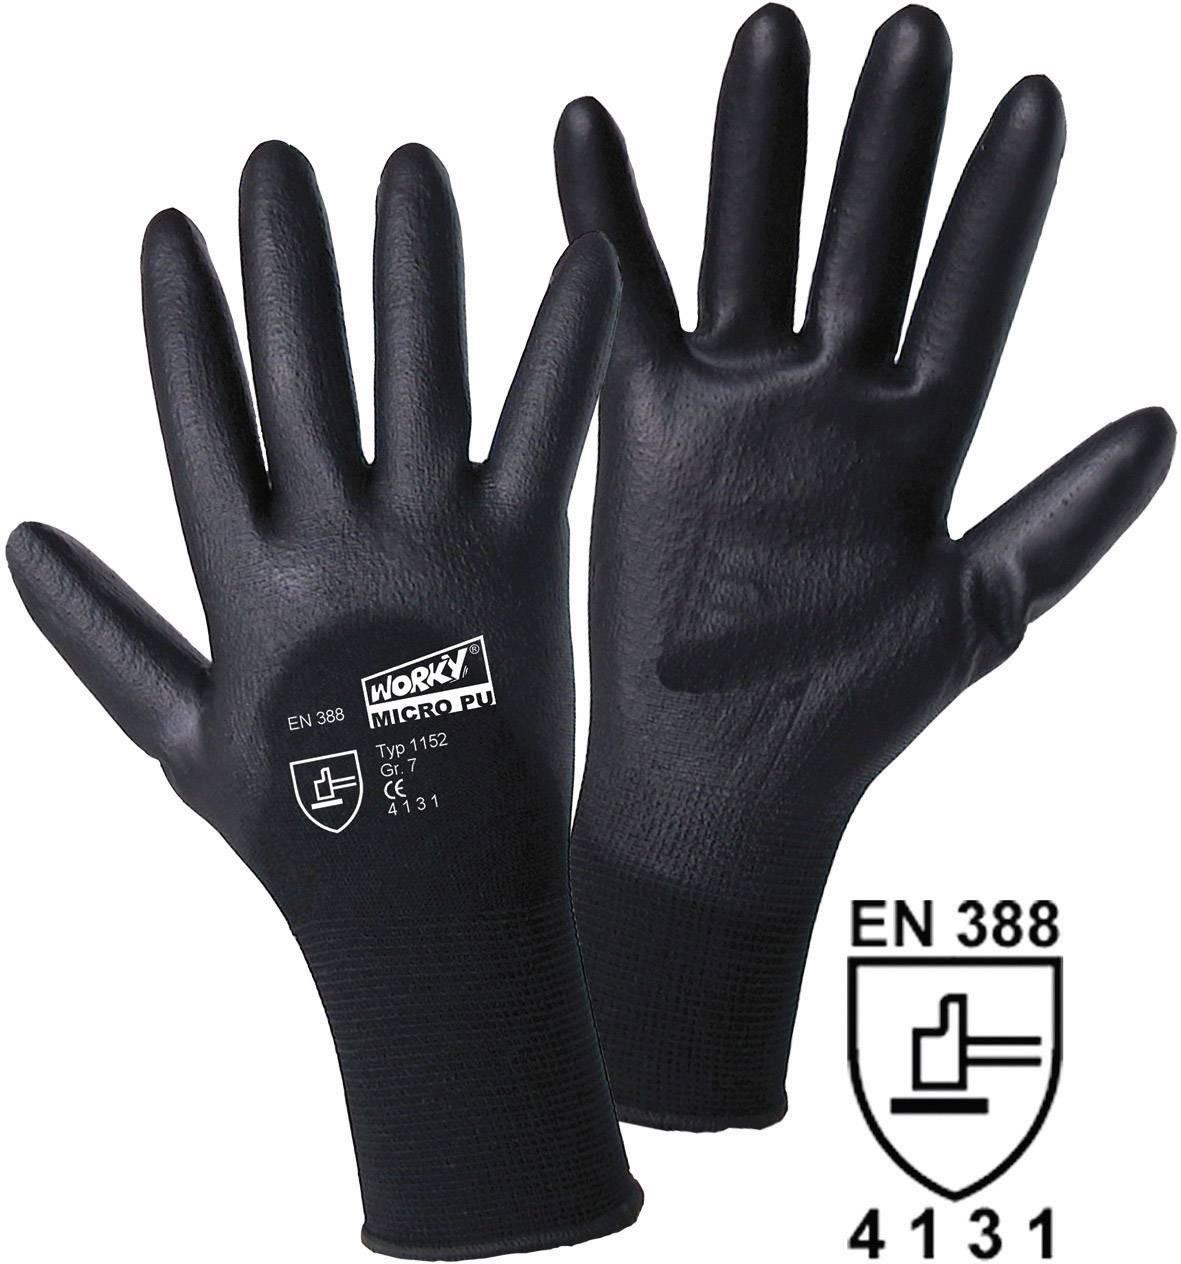 Pracovné rukavice L+D worky MICRO black 1152, velikost rukavic: 7, S